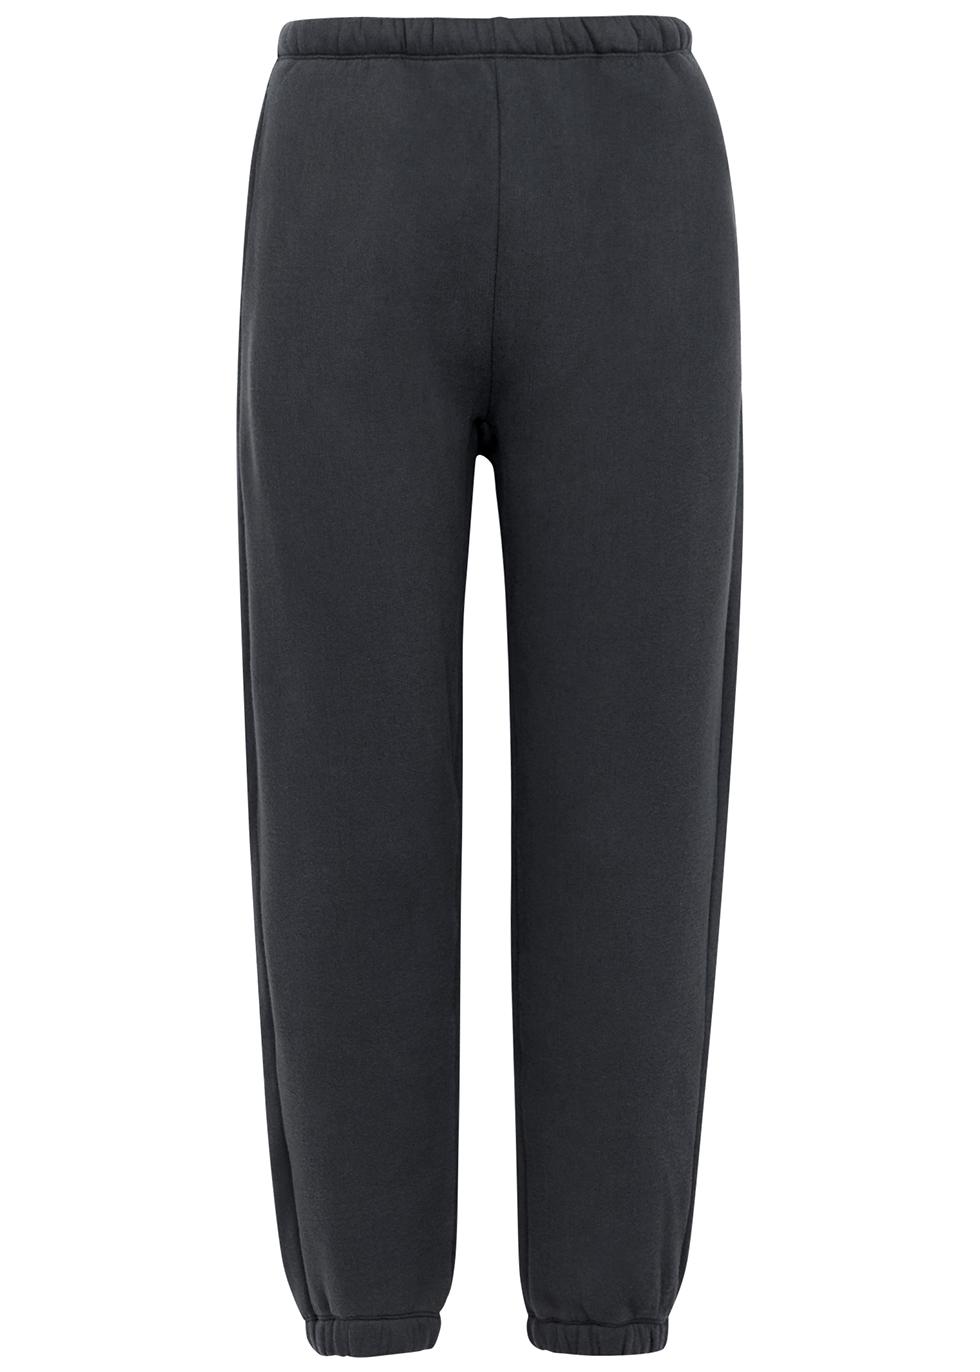 Ikatown dark grey cotton-blend sweatpants